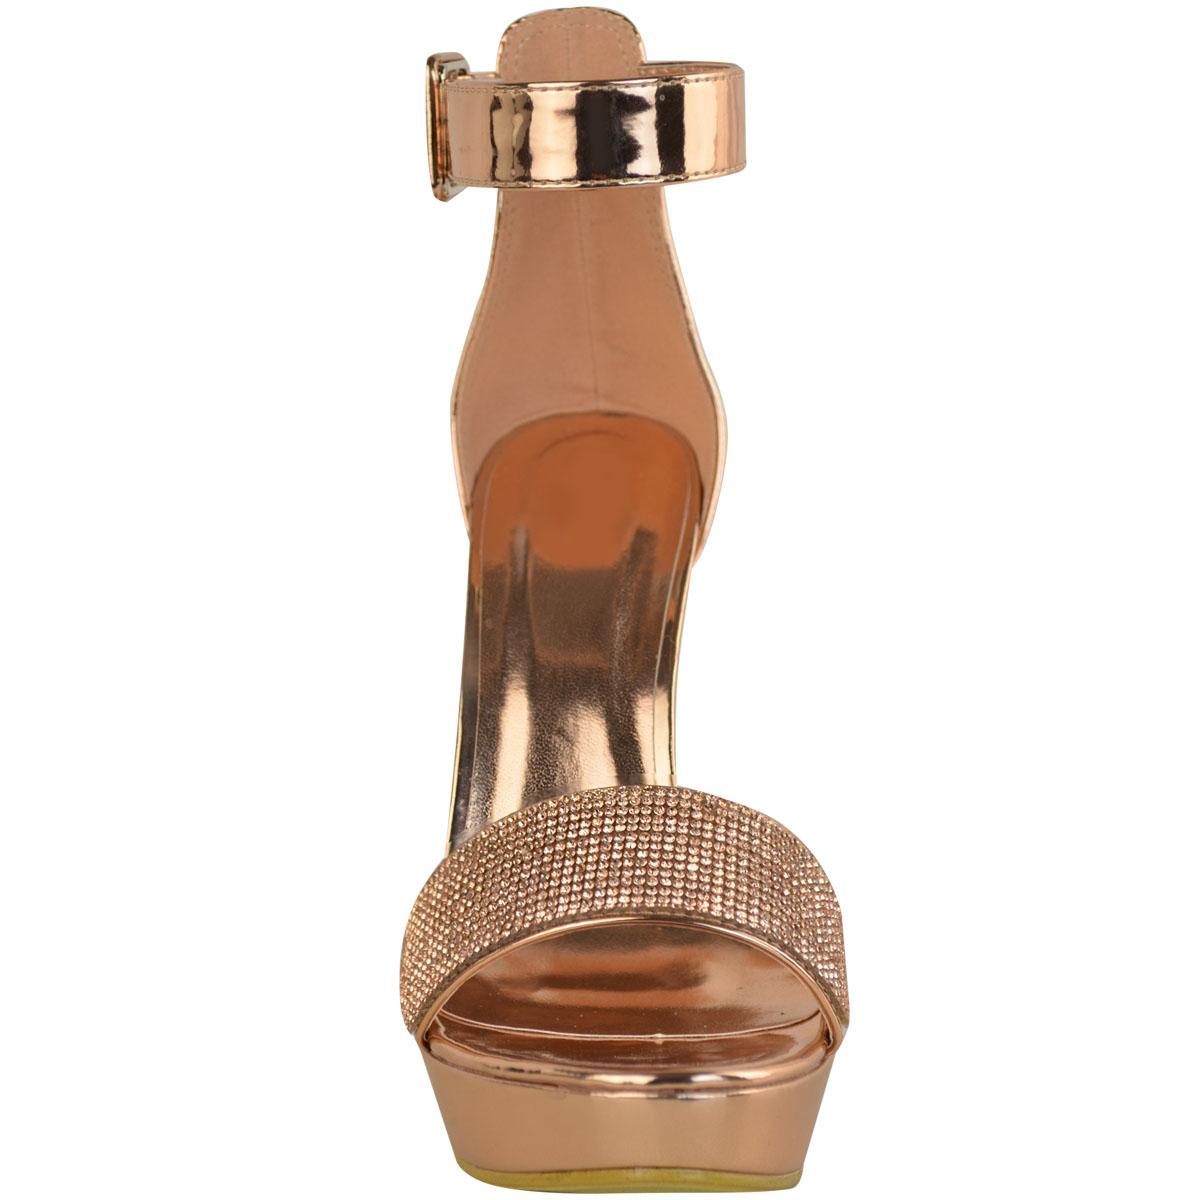 Womens-Ladies-Stilettos-High-Heels-Strappy-Platforms-Sandals-Diamante-Shoes-Size thumbnail 25